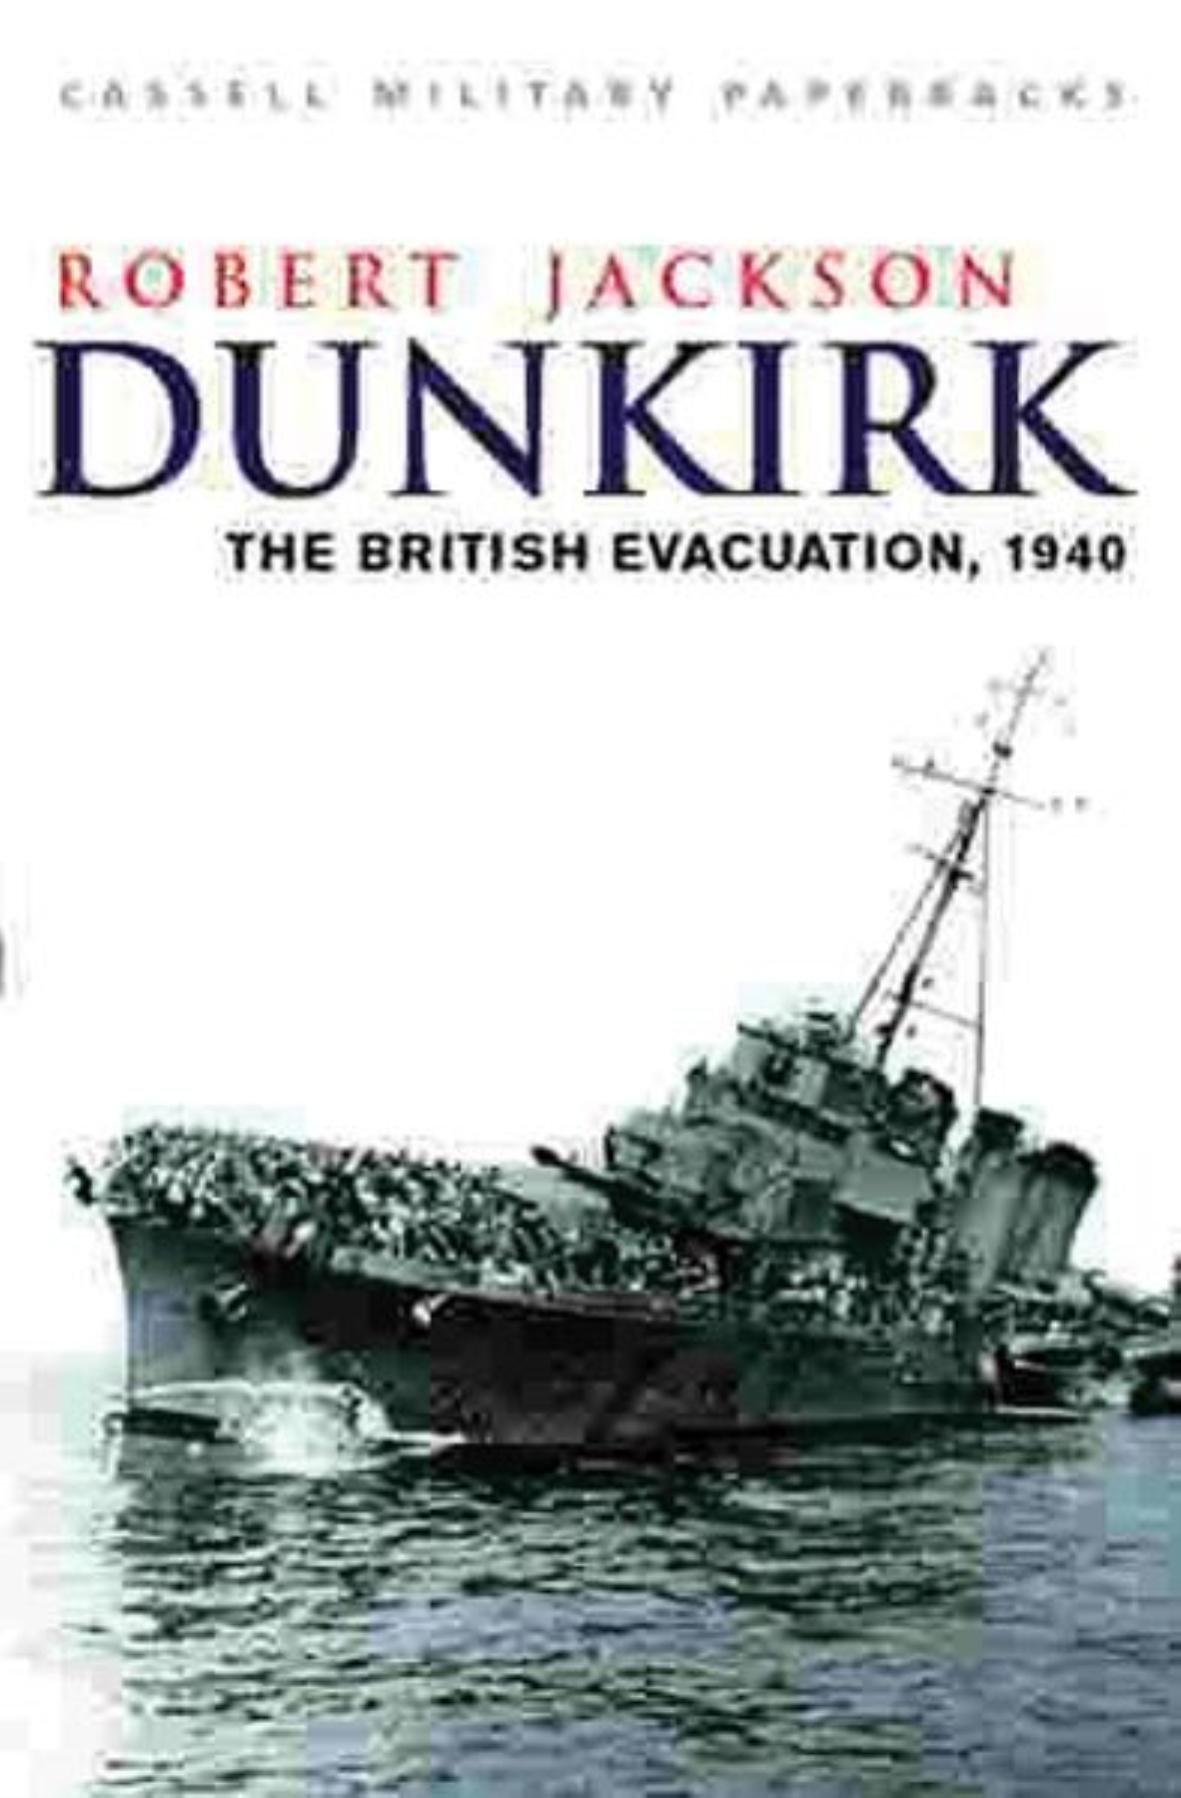 Dunkirk: The British Evacuation, 1940 (Cassell Military Paperbacks) pdf epub